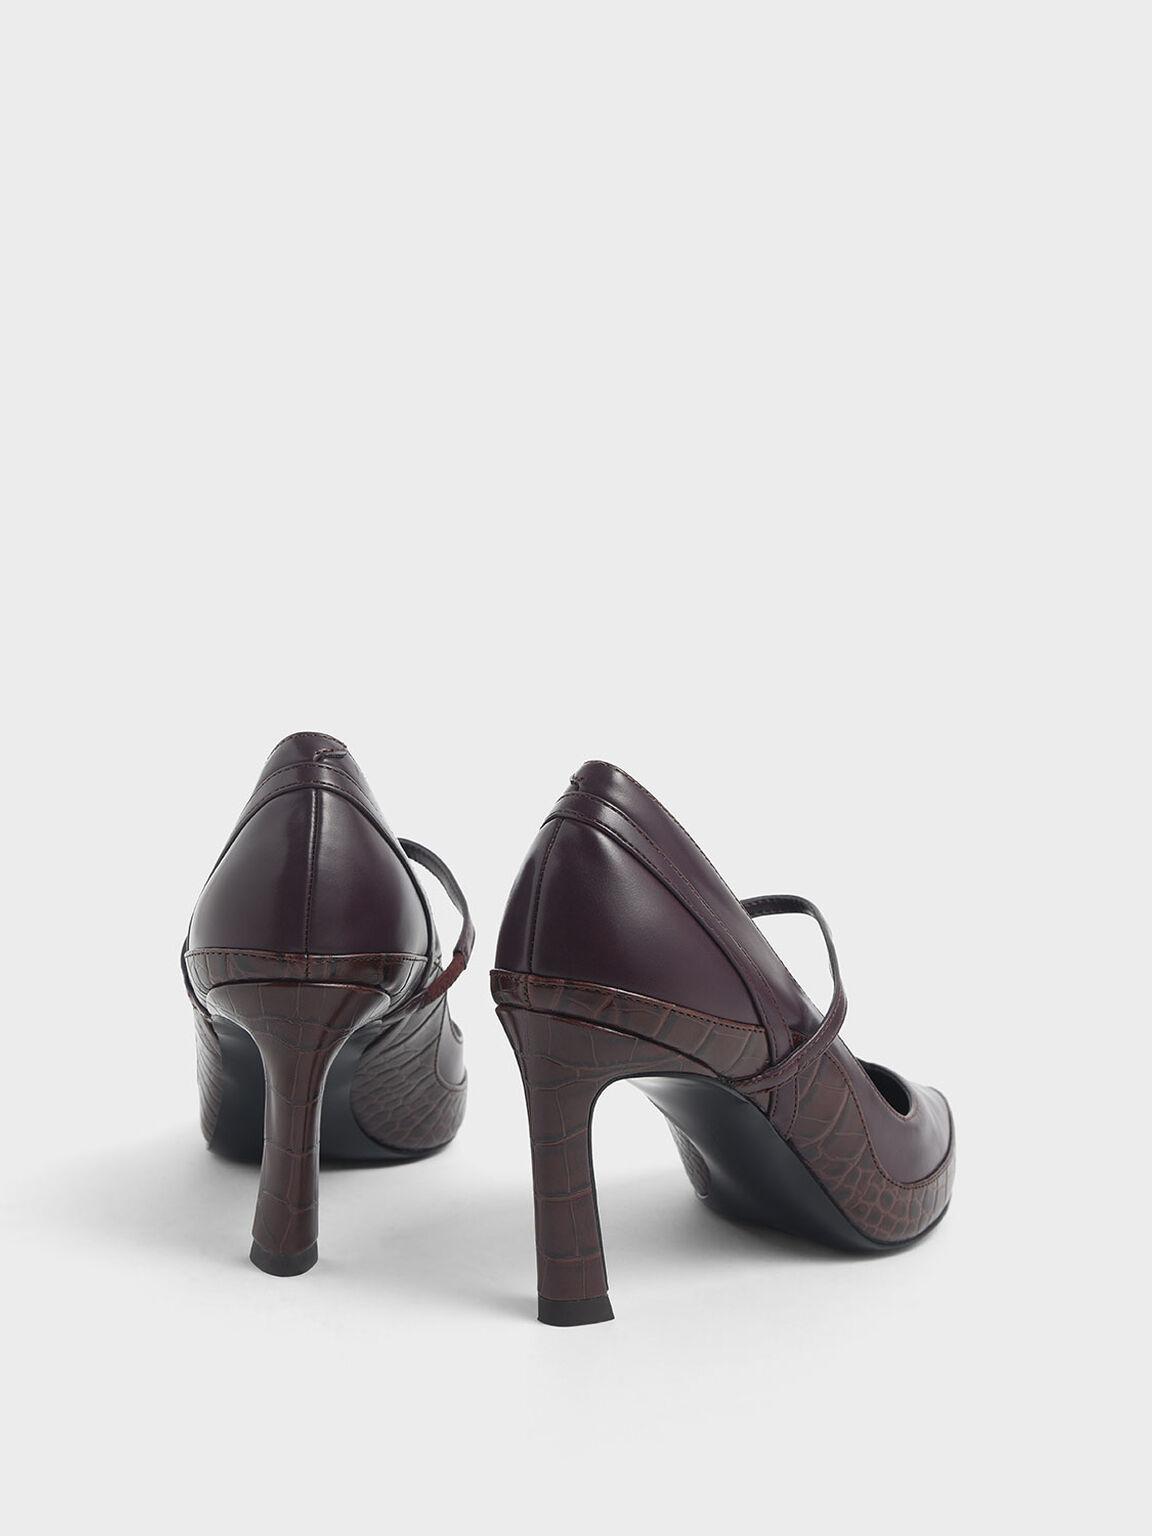 Croc-Effect Pointed Toe Mary Jane Sculptural Heels, Burgundy, hi-res